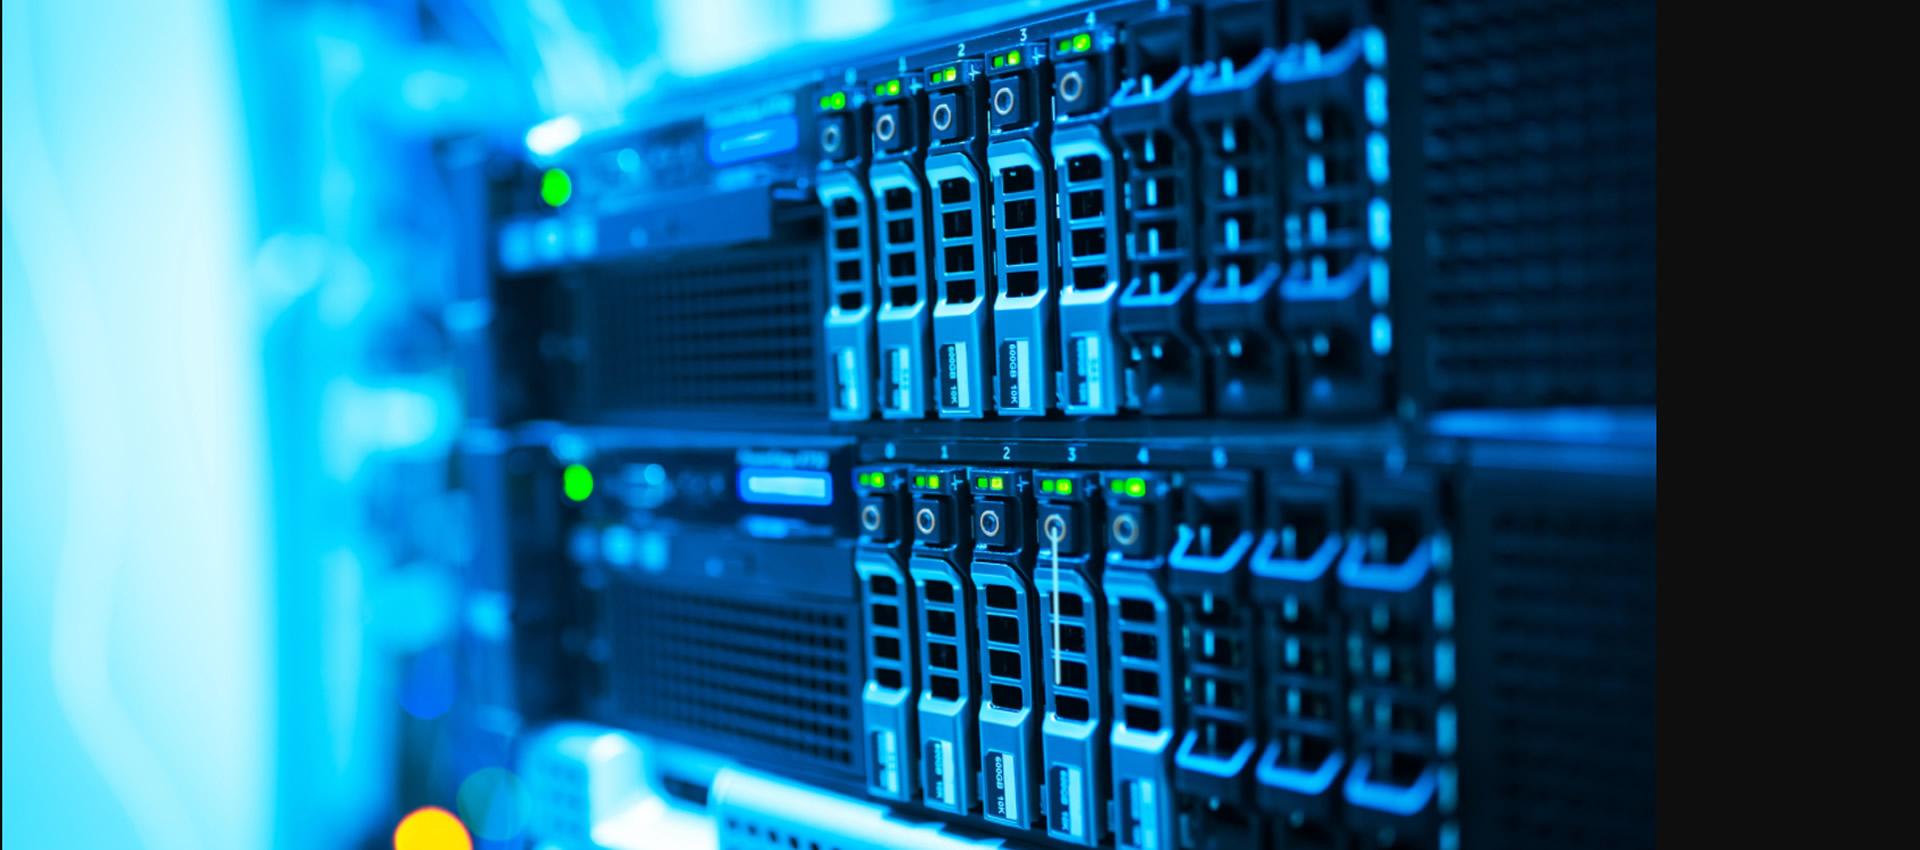 inlab cloud service